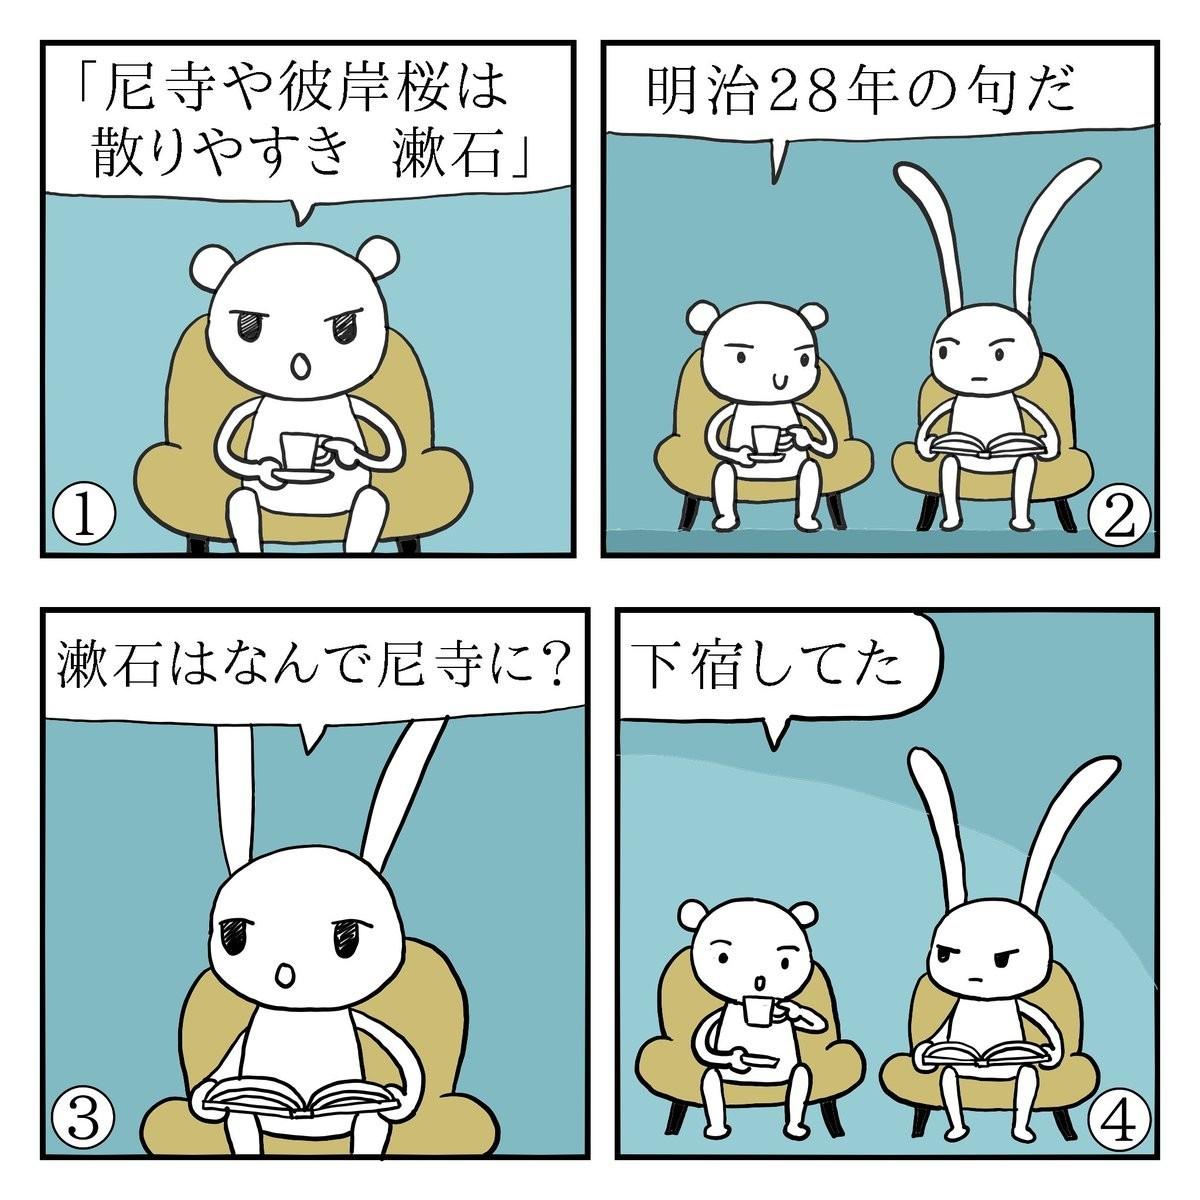 f:id:kanarihikokuma:20190319081302j:image:w330